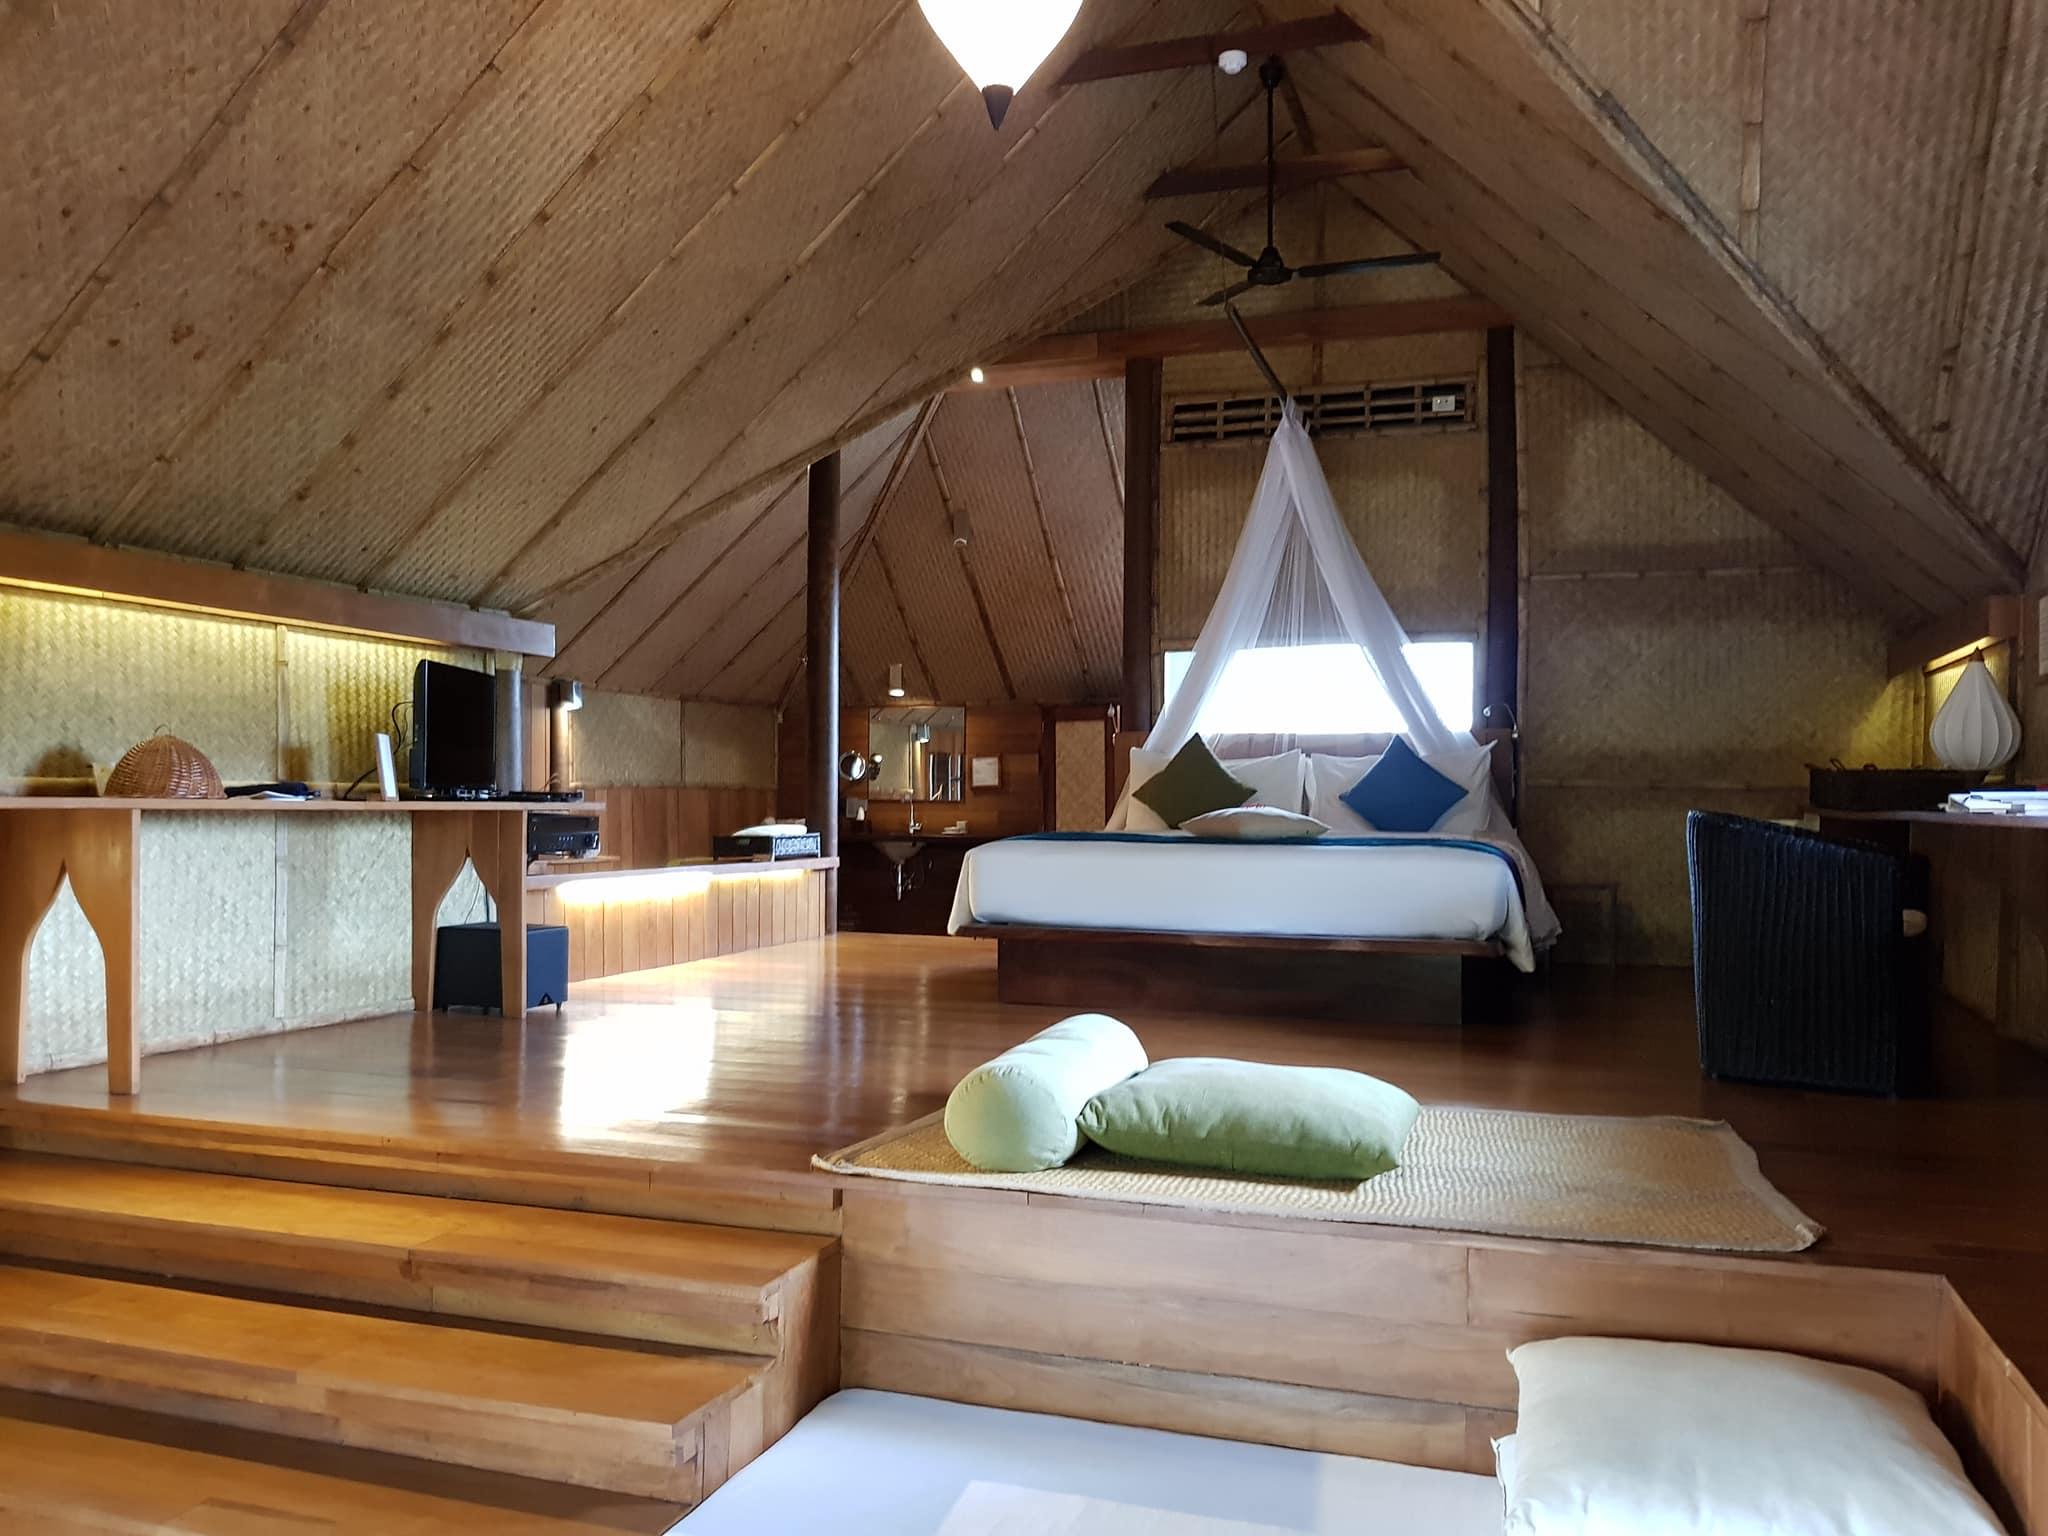 invite-to-paradise-sri-lanka-maldives-holiday-honeymoon-specialists-customer-guest-feedback-zane-lisa-butcher-jetwing-vil-uyana-hotel-sigiriya-cultural-triangle-room-interior.jpg